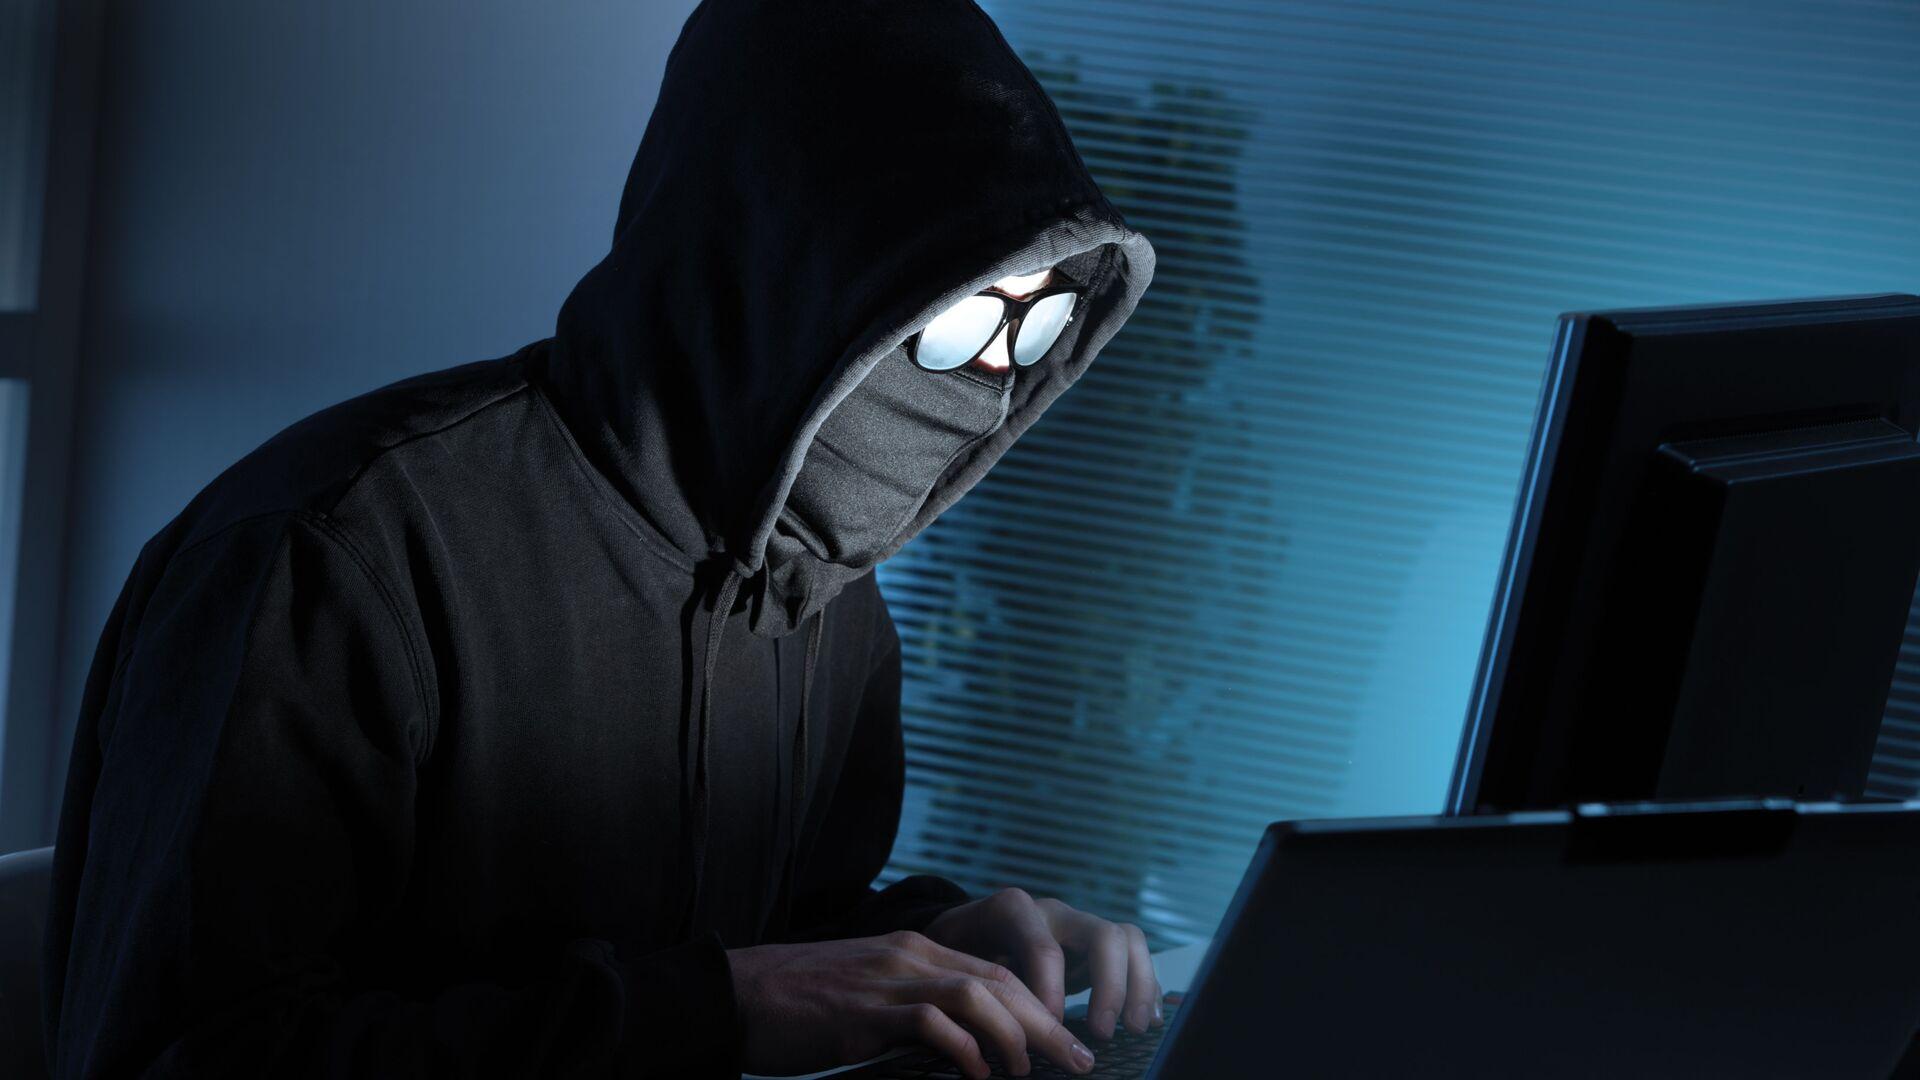 Un hacker al lavoro - Sputnik Italia, 1920, 05.07.2021